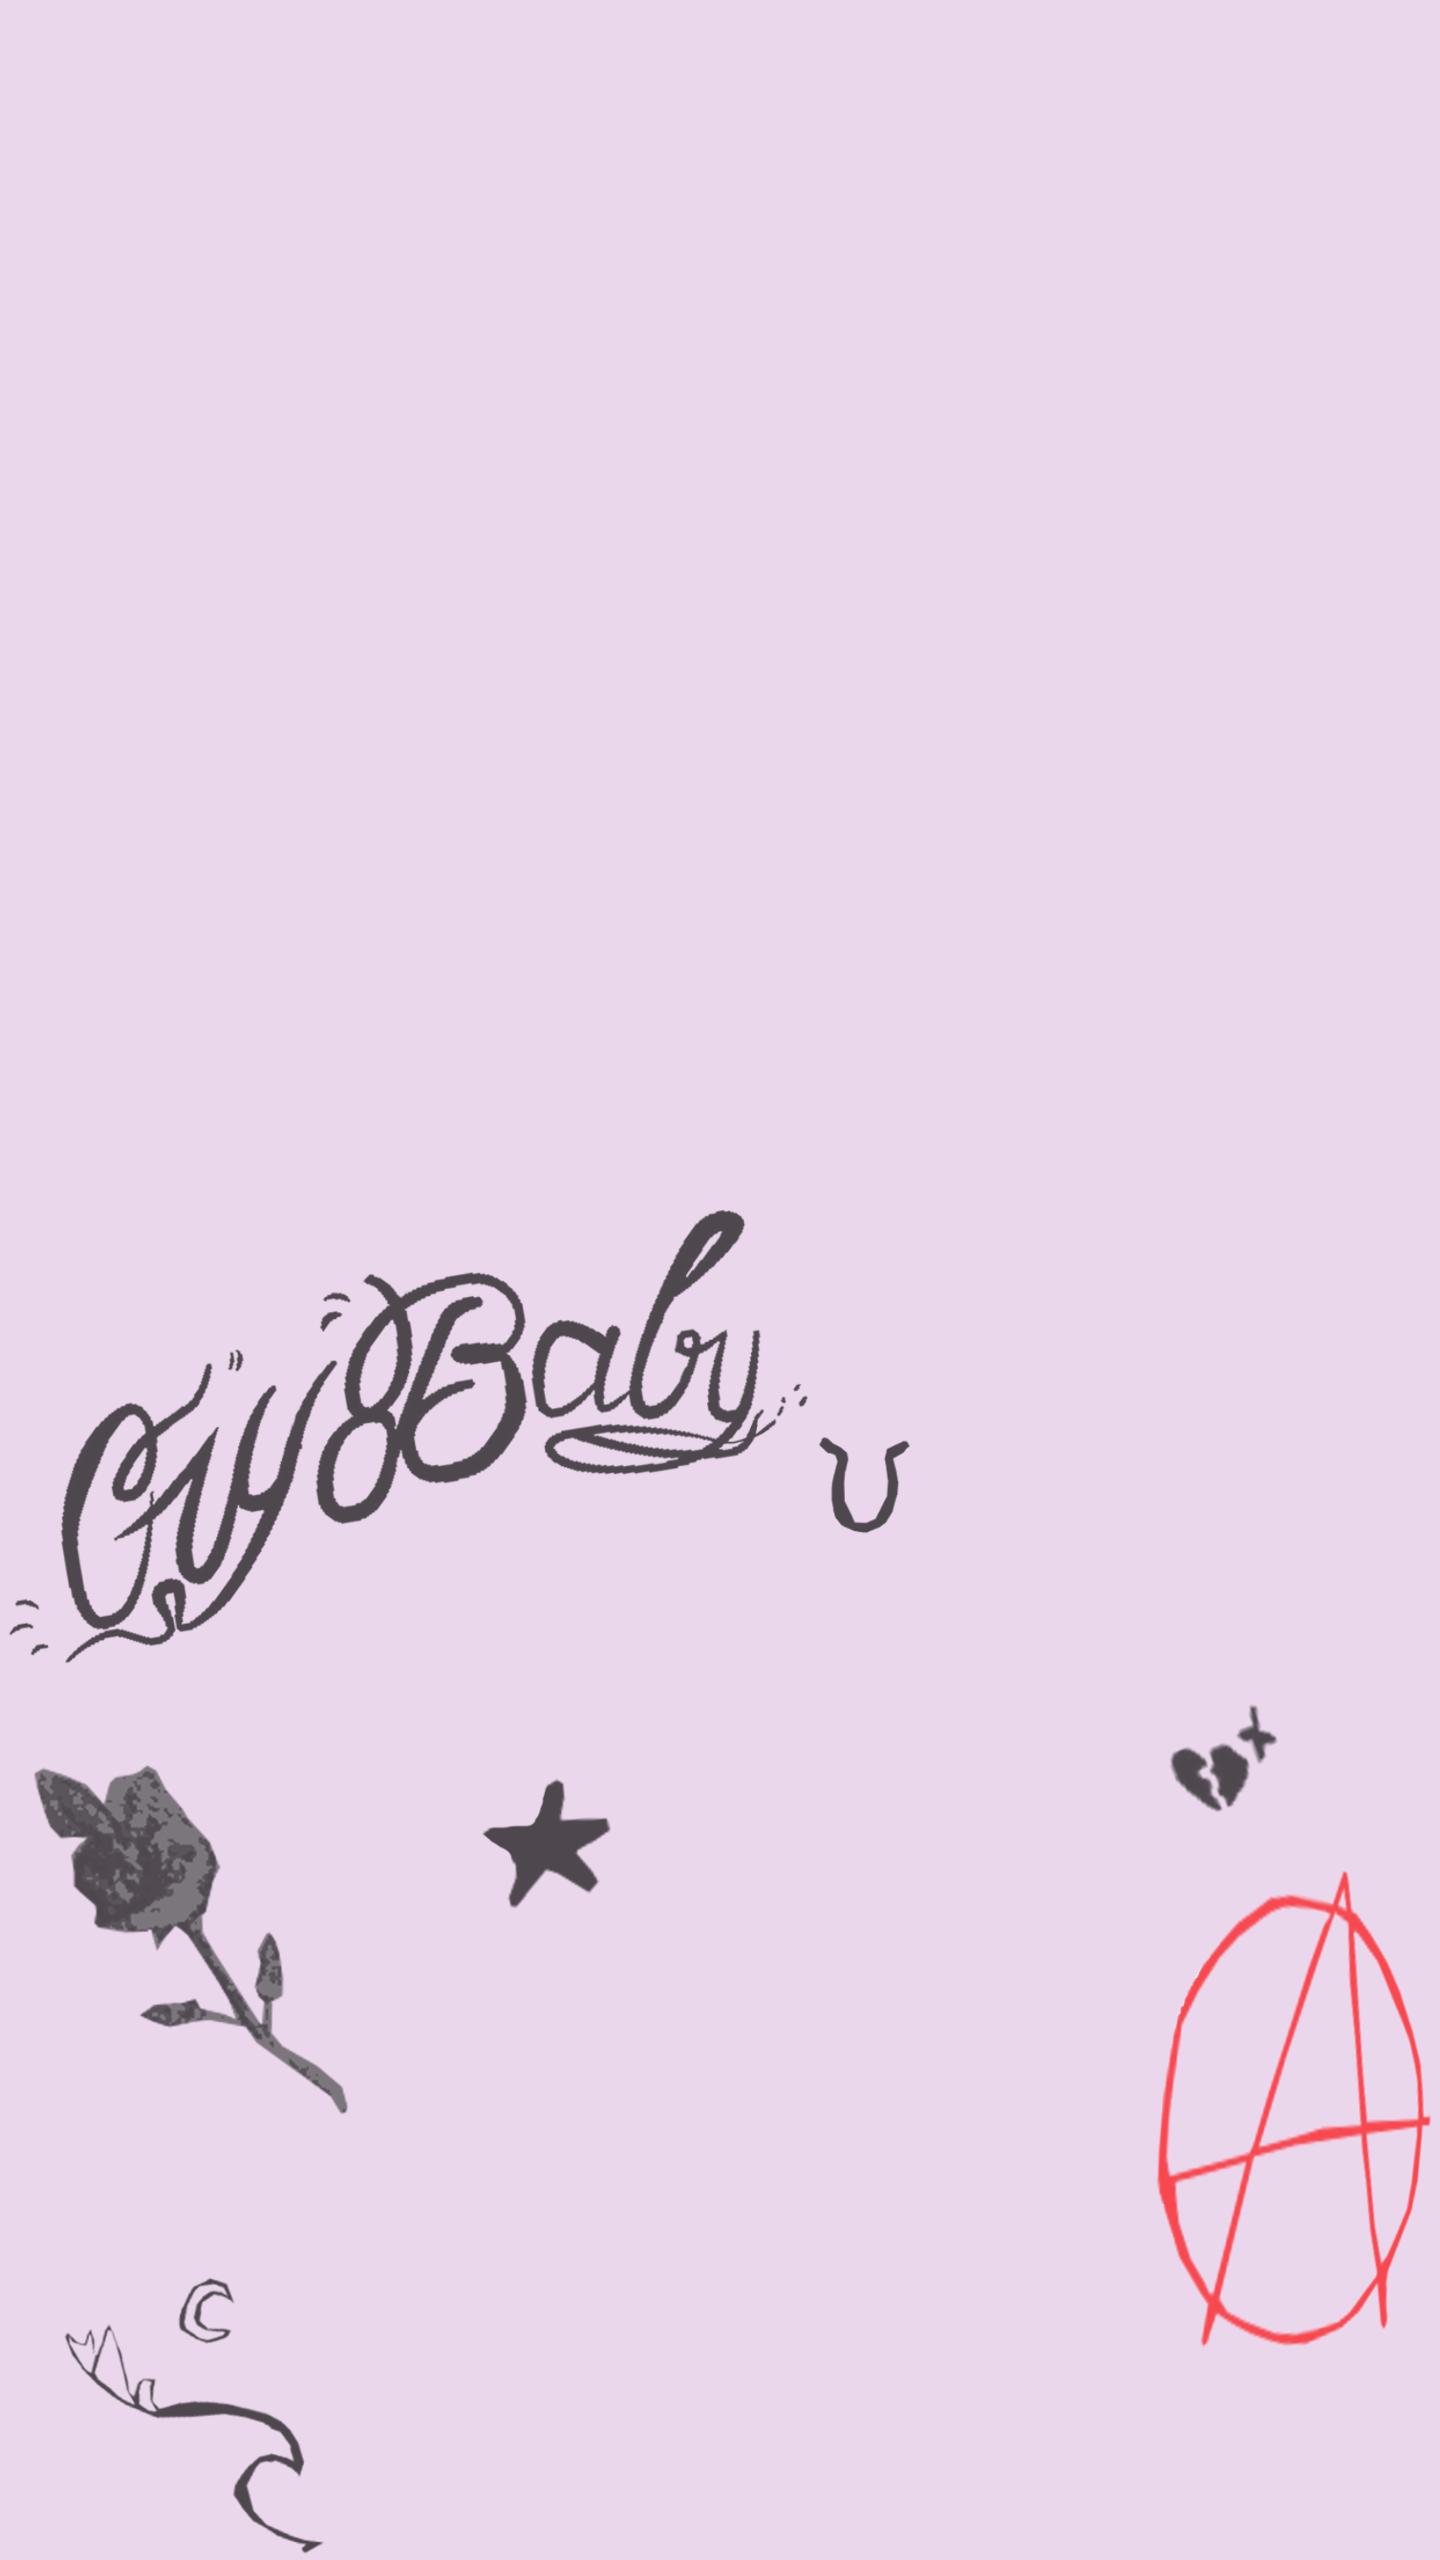 Aesthetic Lil Peep Desktop Wallpaper